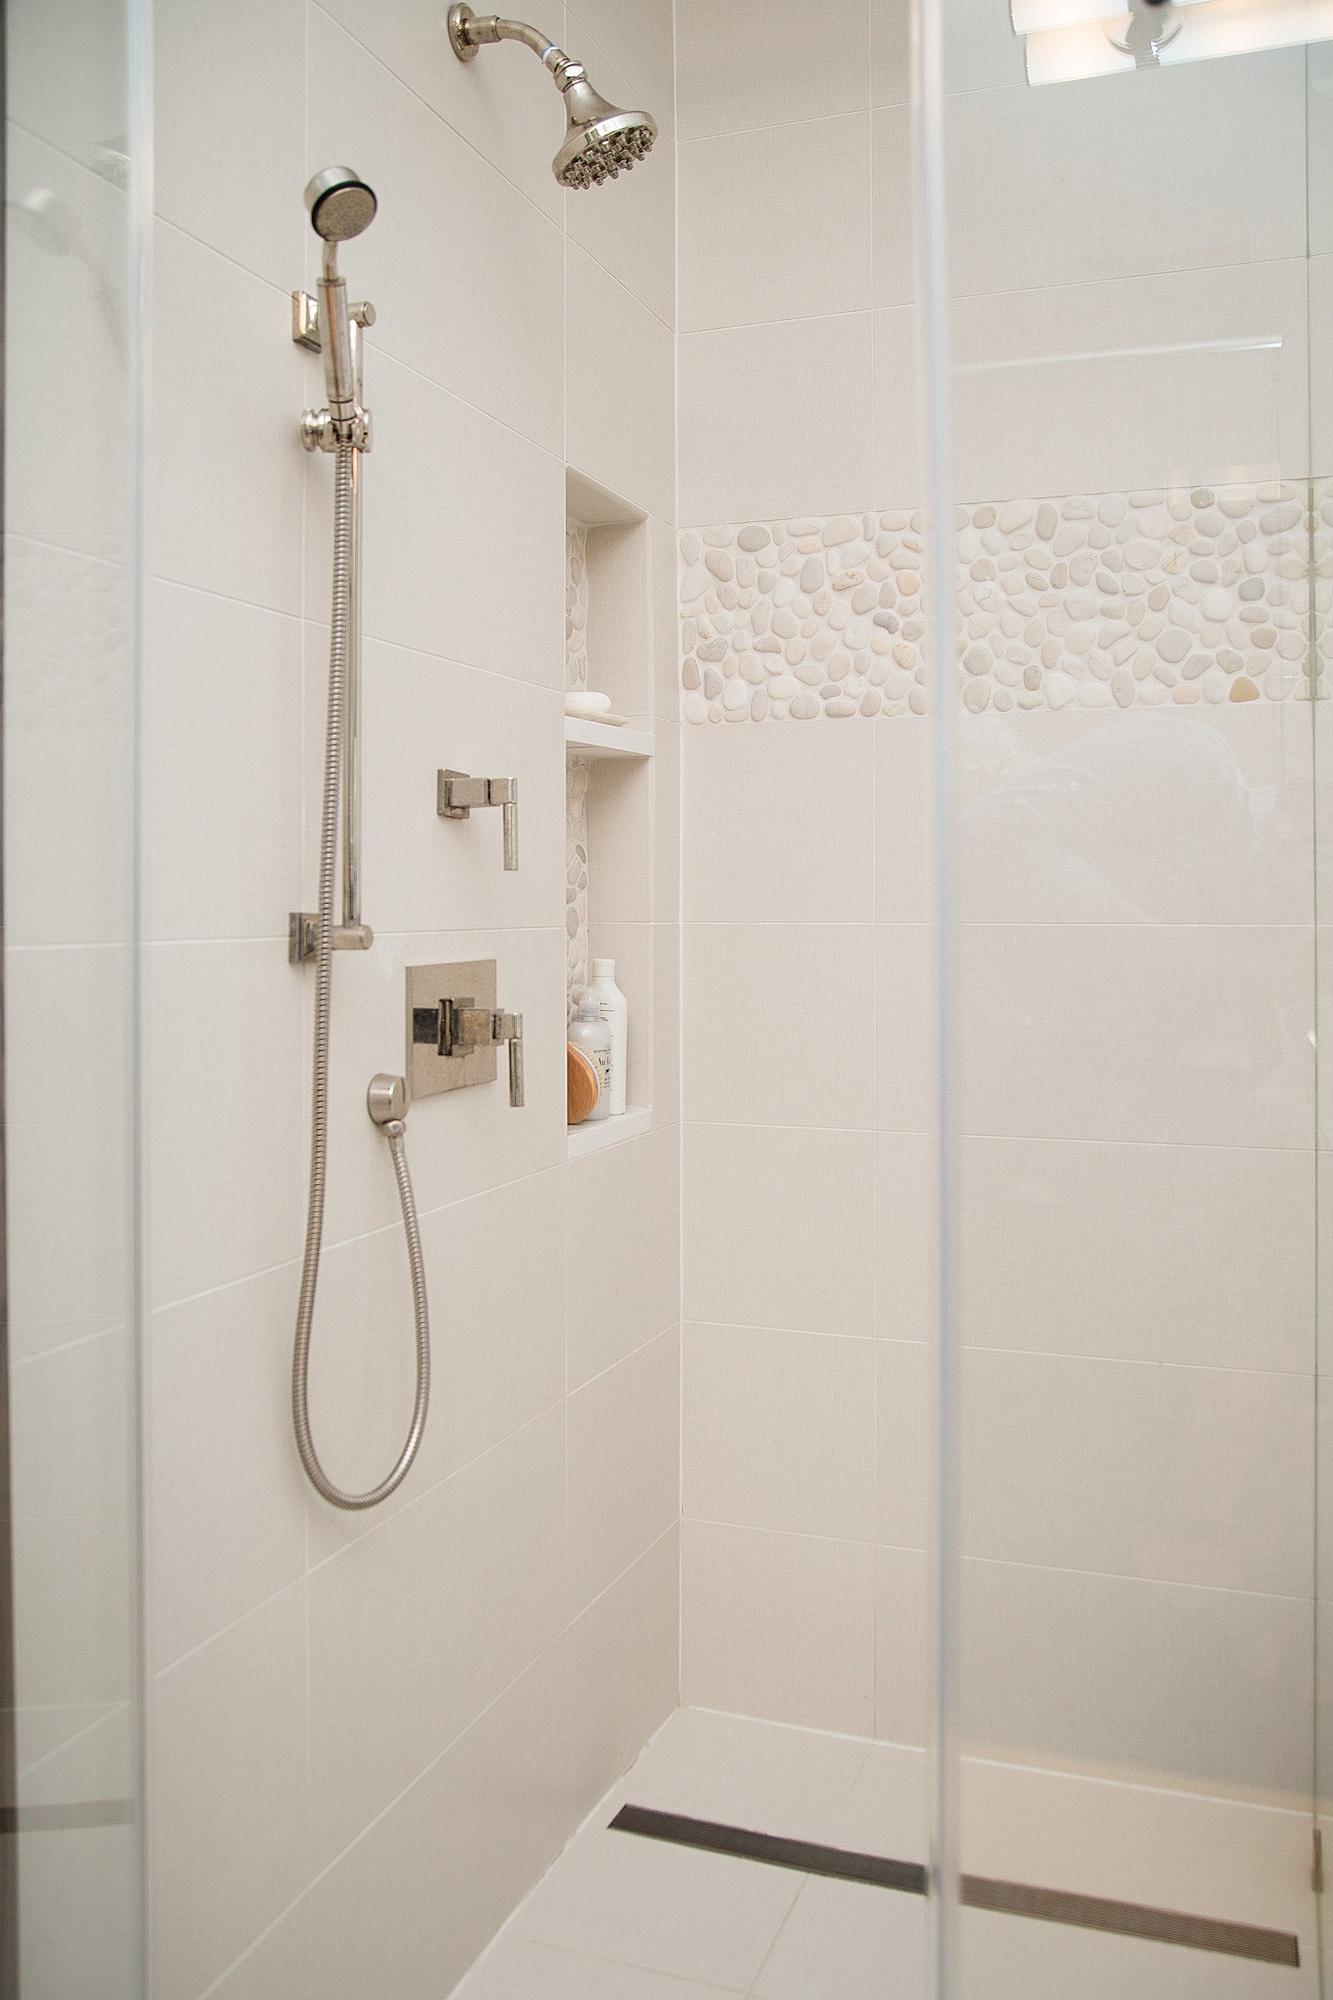 Master bathroom remodel w curbless entry and linear drain | Interior Designer: Carla Aston / Photographer: Tori Aston #bathroomideas #bathroomremodel #zeroentryshower #curblessshower #lineardrain